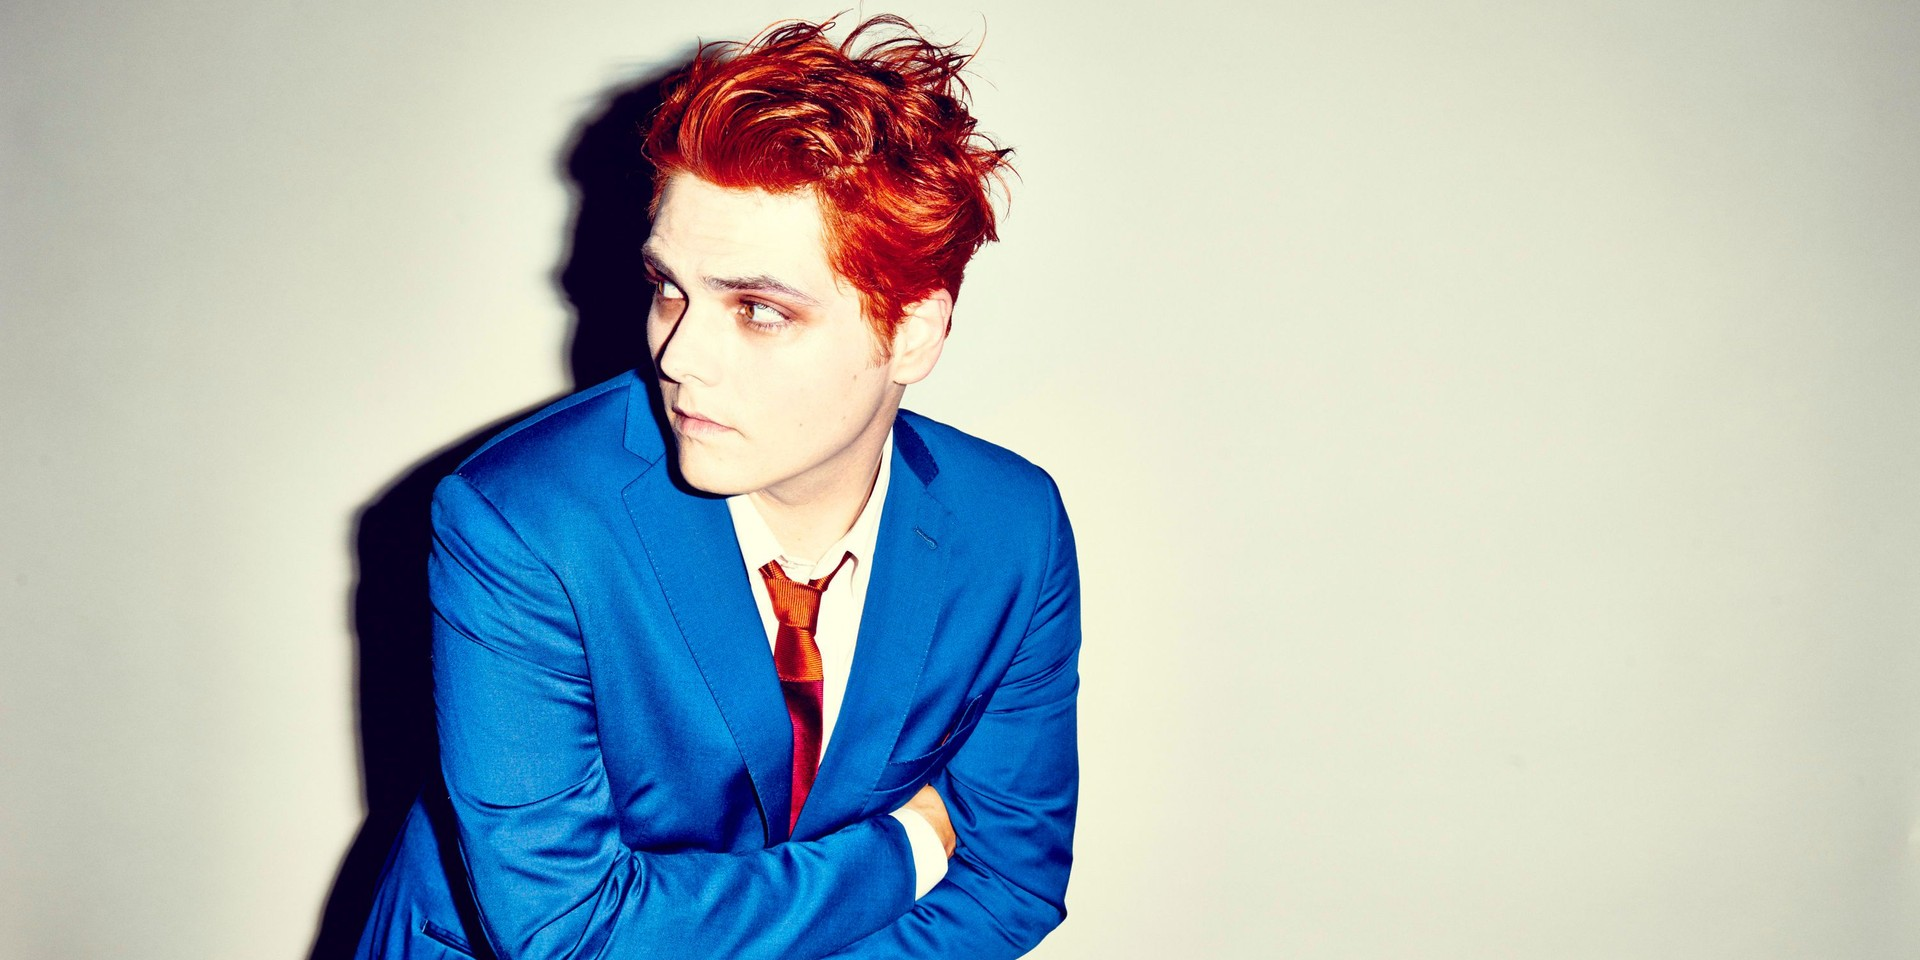 Gerard Way's Netflix series The Umbrella Academy has inspired new music